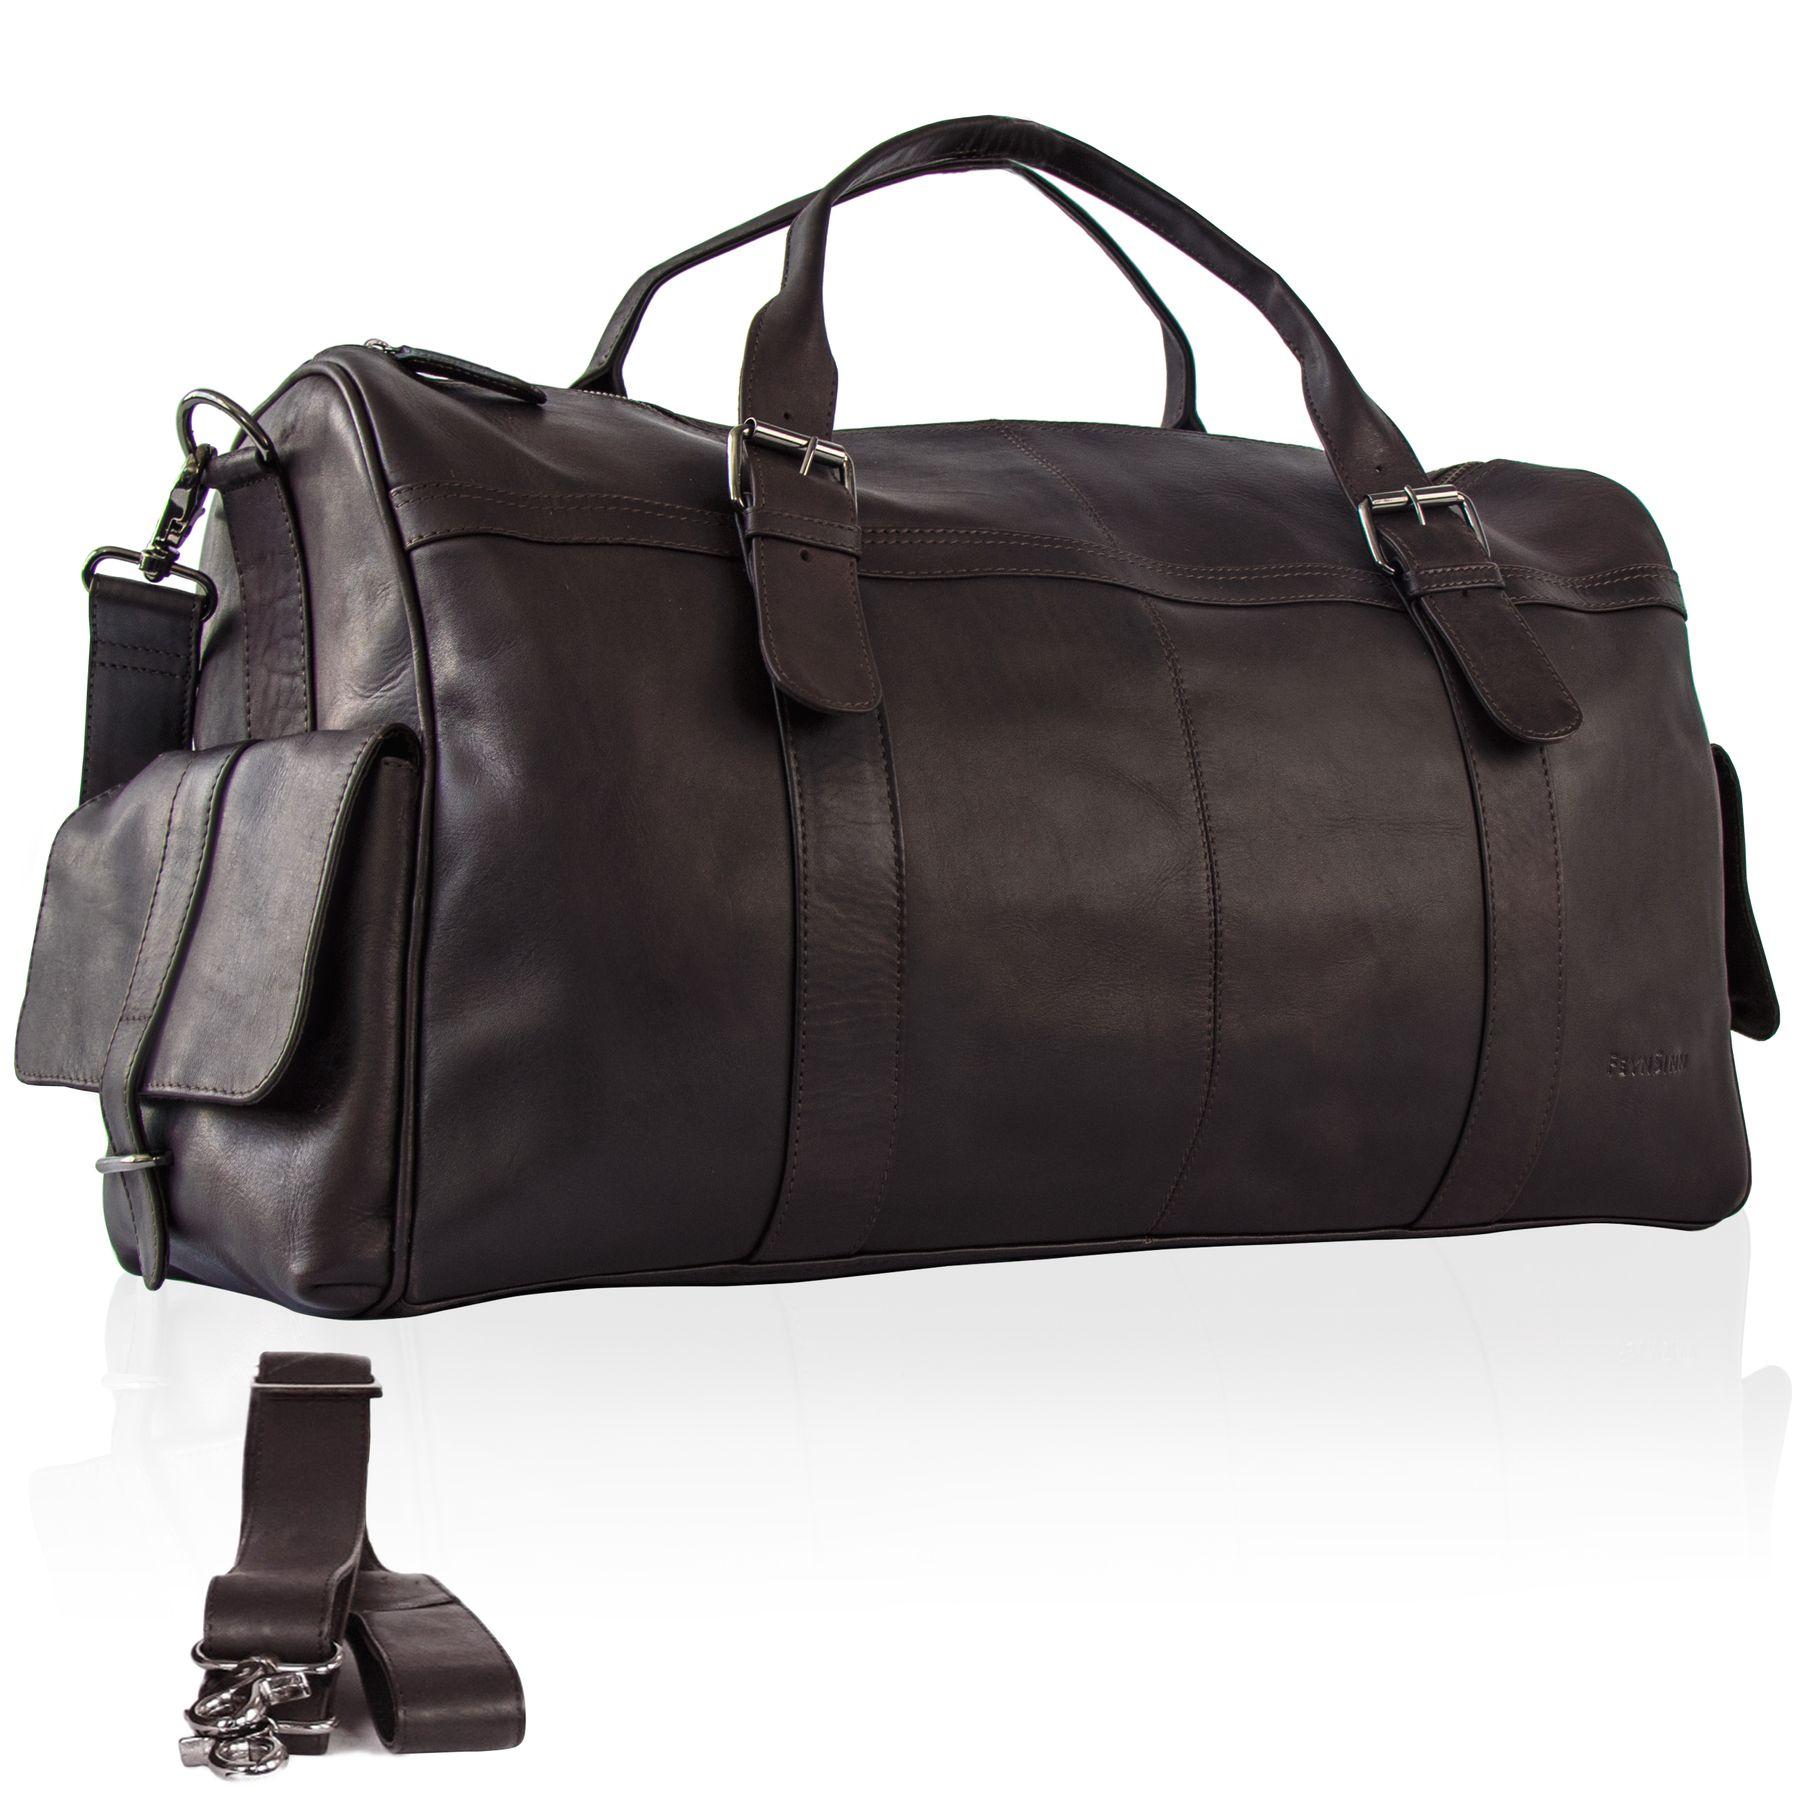 3485392903db FEYNSINN travel bag holdall Smooth Leather ASHTON brown weekender ...